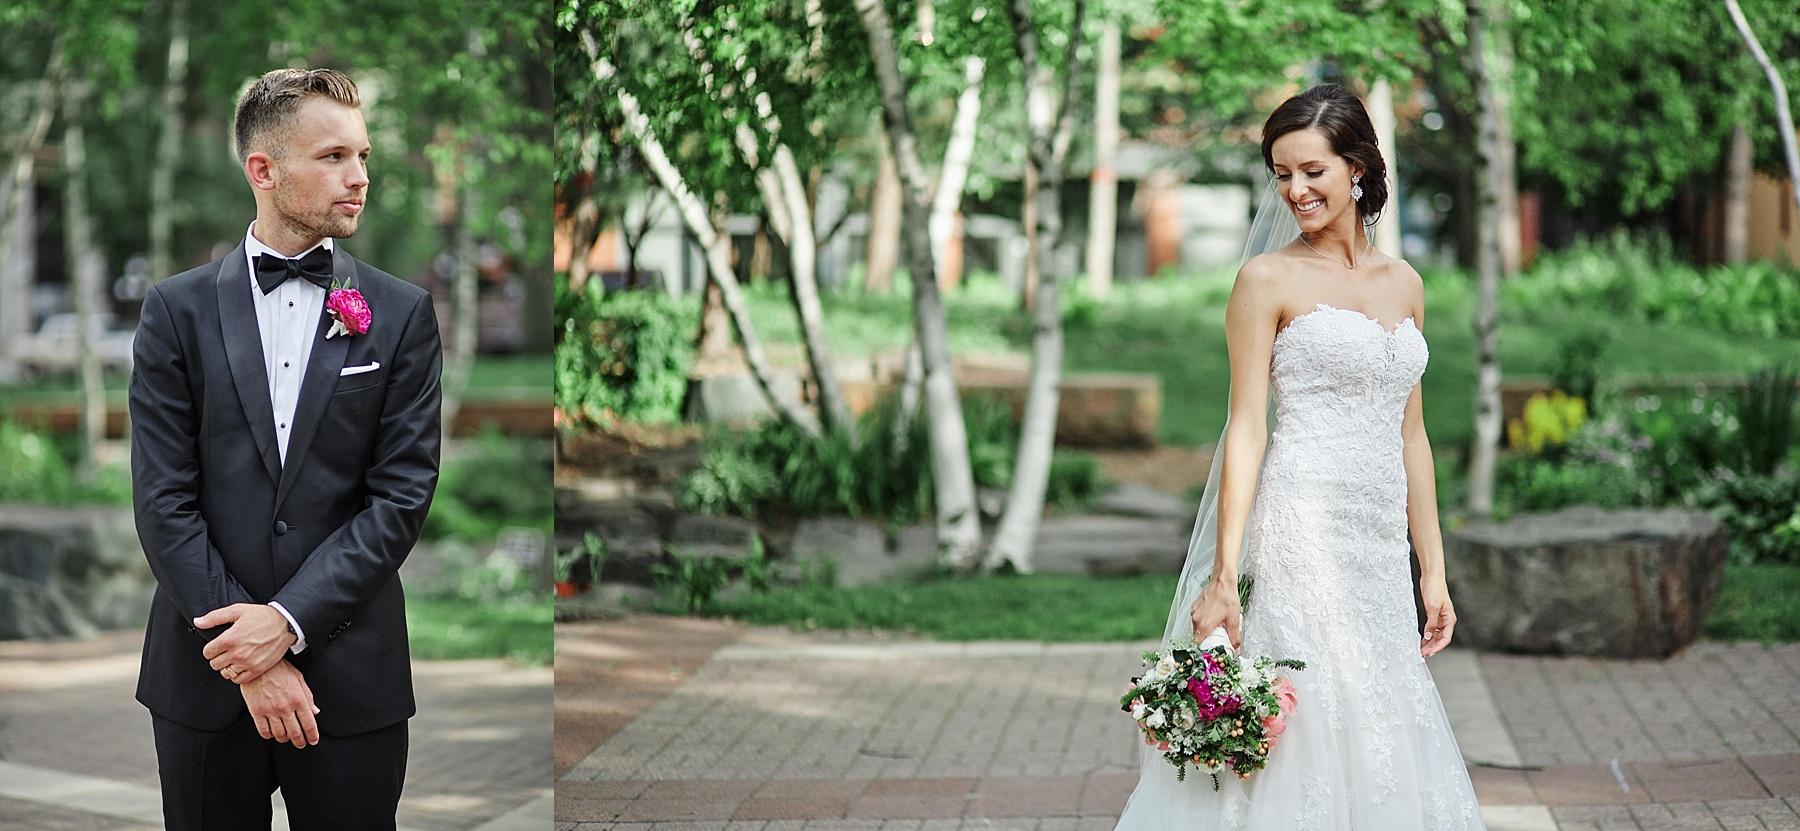 ABULAE-Wedding-Saint-paul-MN-Josh-Sofia-Wedding-Mears-Park_0795.jpg